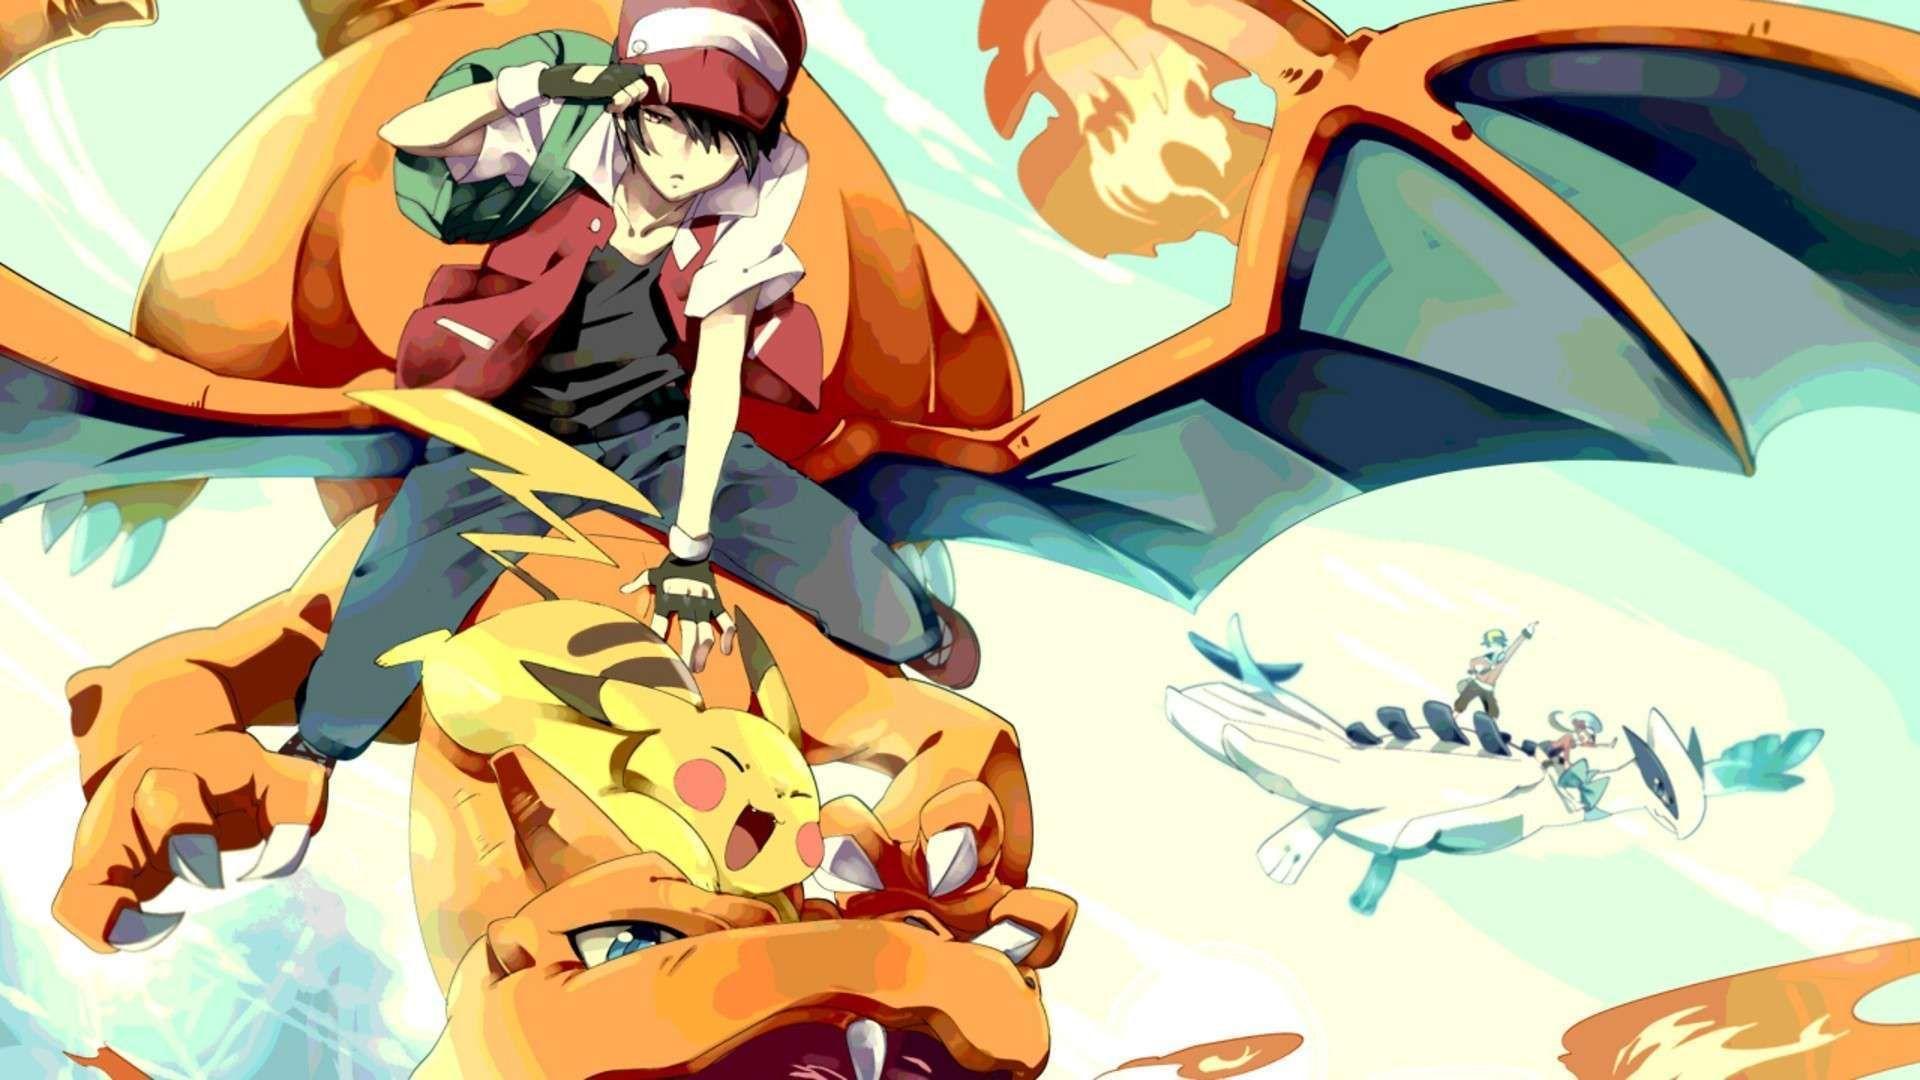 Pokemon Anime Wallpapers Top Free Pokemon Anime Backgrounds Wallpaperaccess